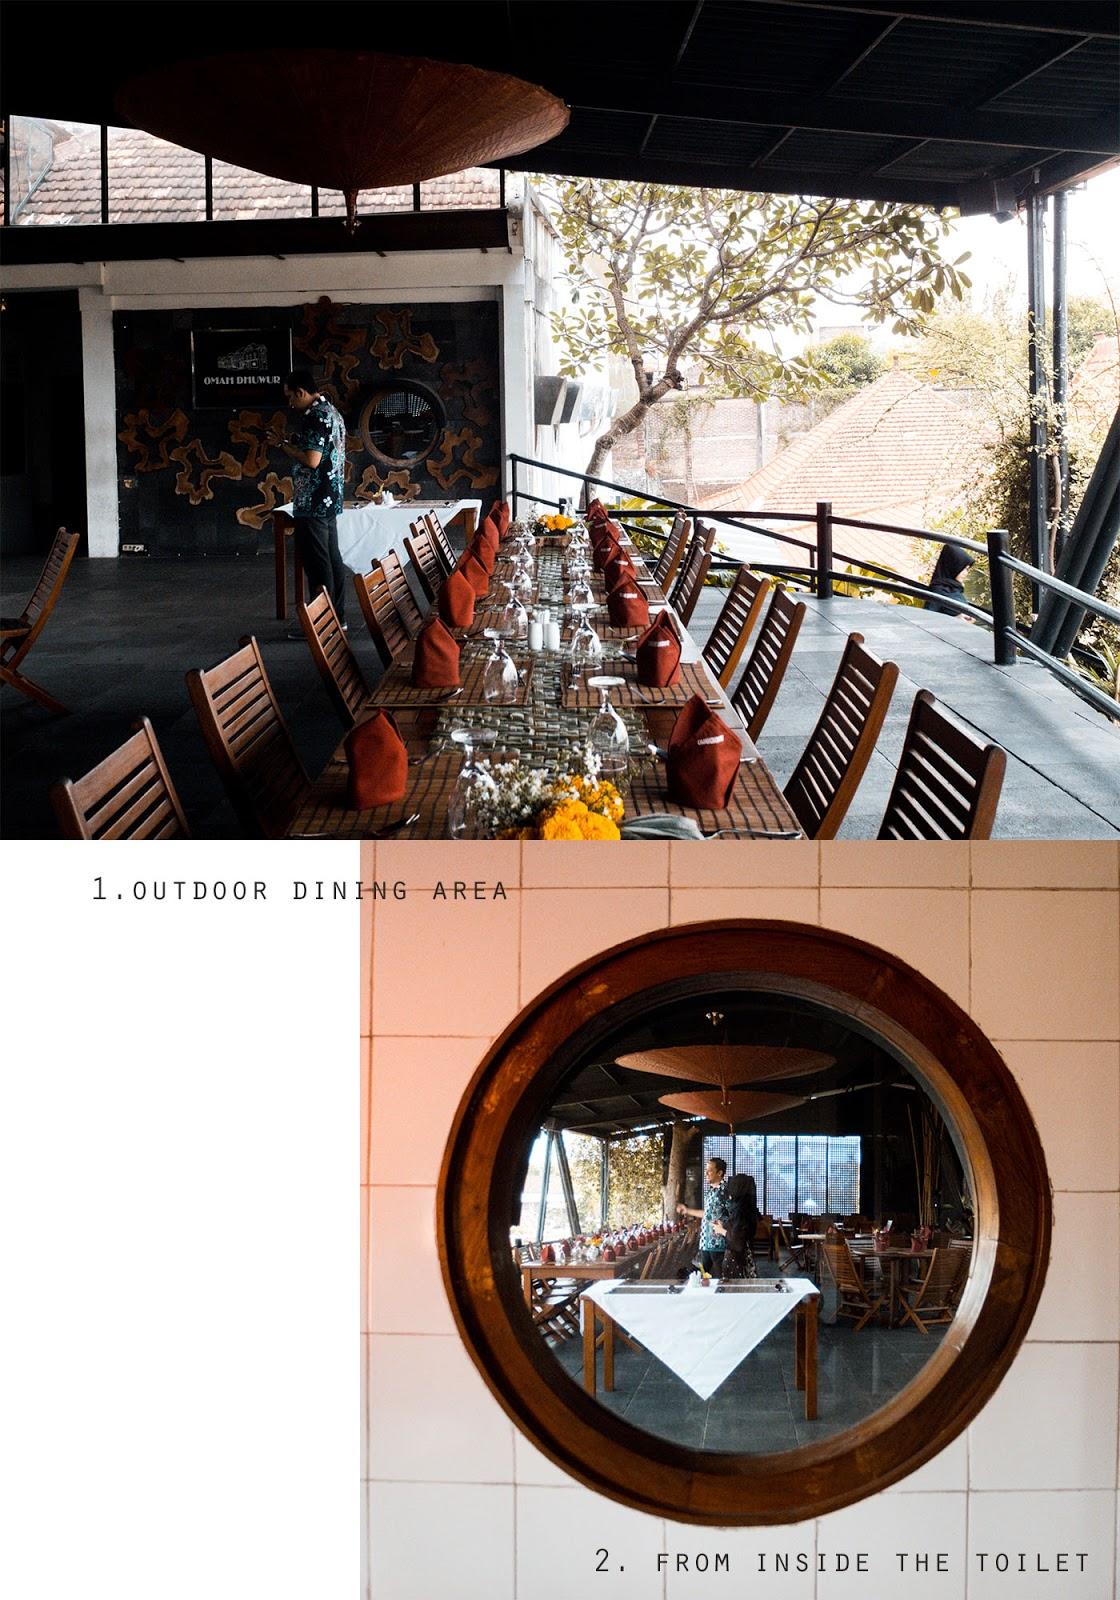 omah dhuwur luxurious dining